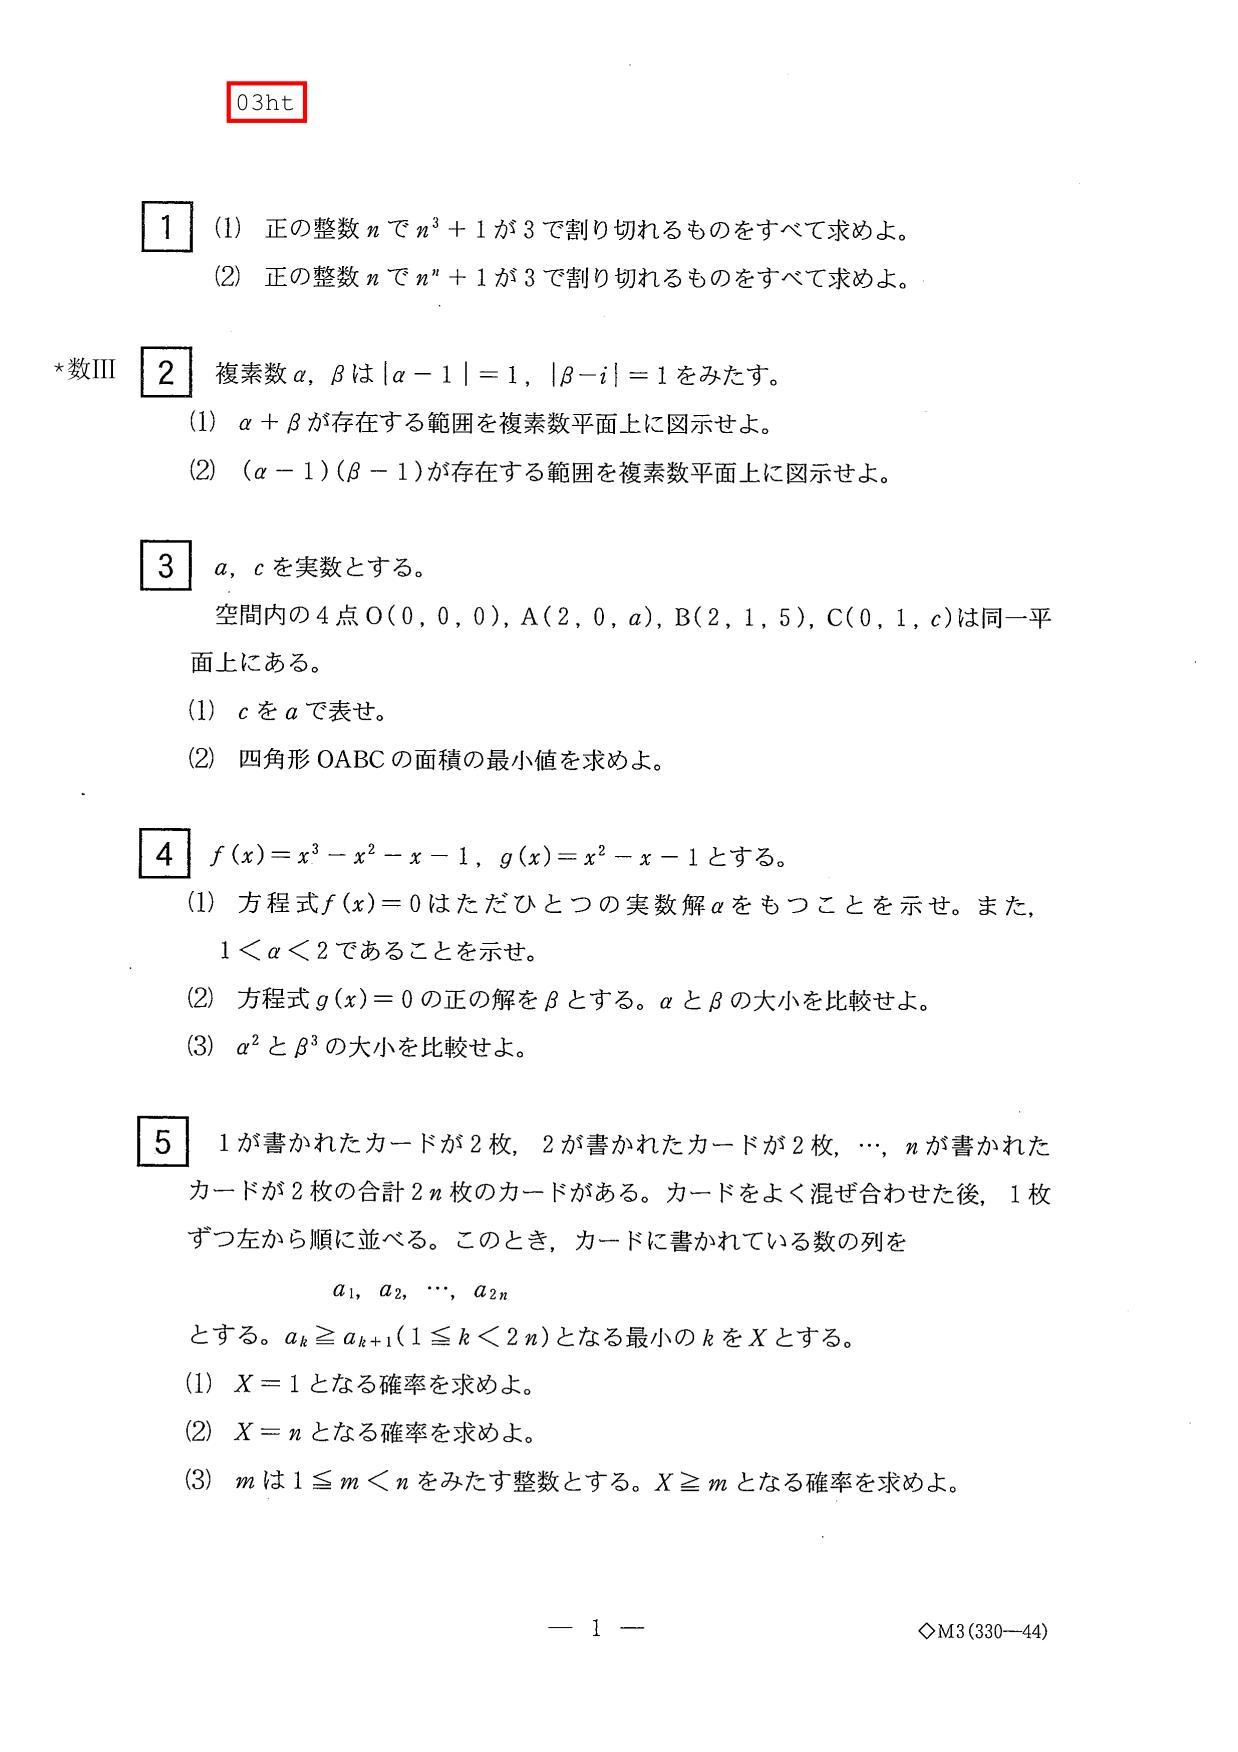 03htmath_01.jpg